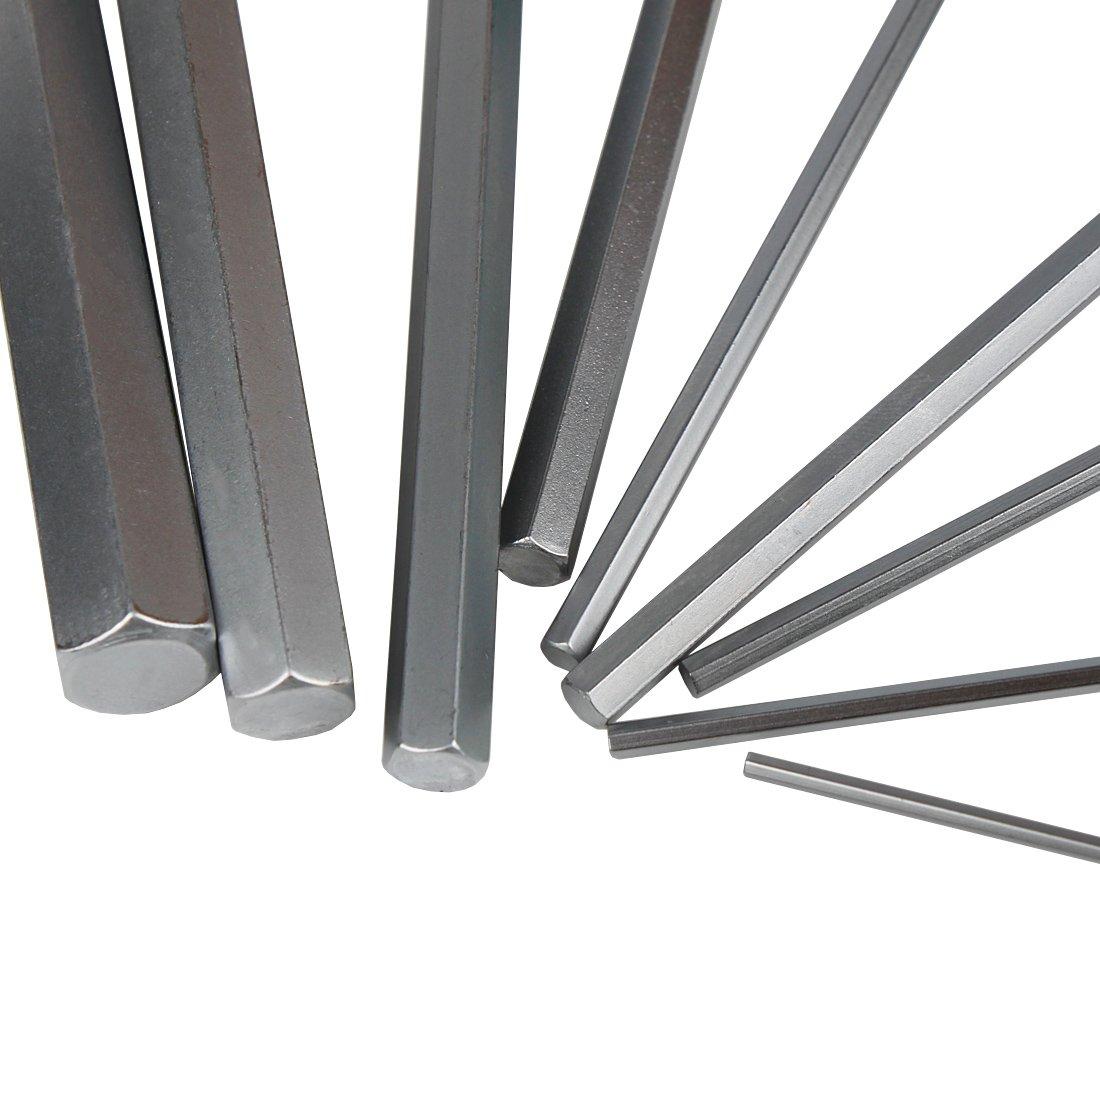 Andux Zone Hexagonal Metric Wrench T-Handle Hex Keys NLJBS-02 5mm